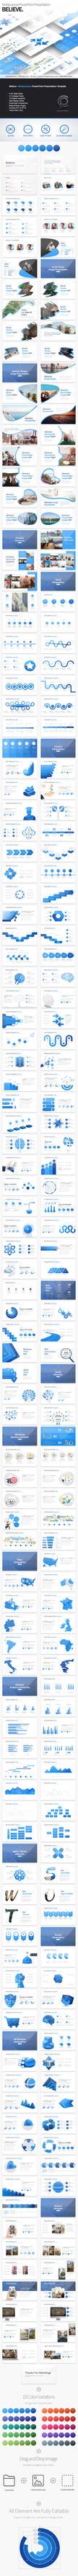 Believe - Multipurpose PowerPoint Presentation by Pulsecolor